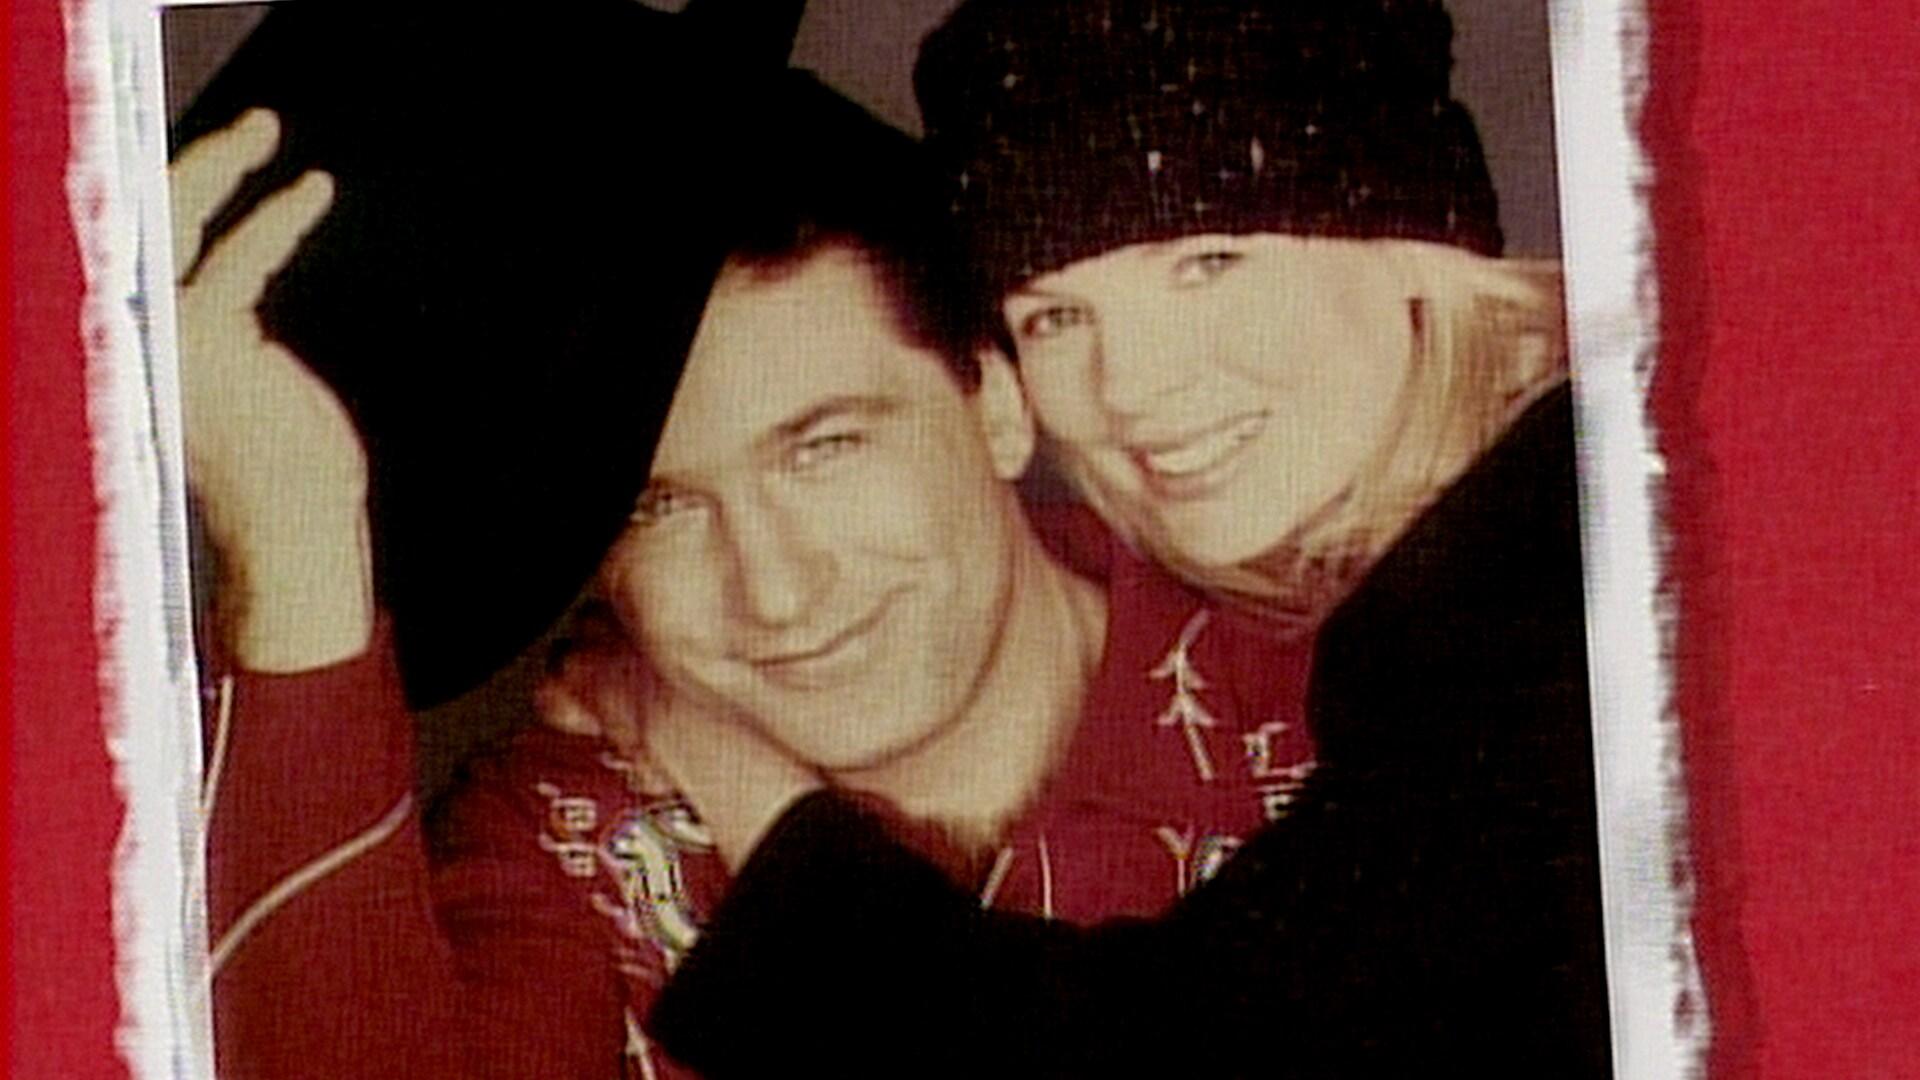 Alec Baldwin and Kim Basinger: February 12, 1994